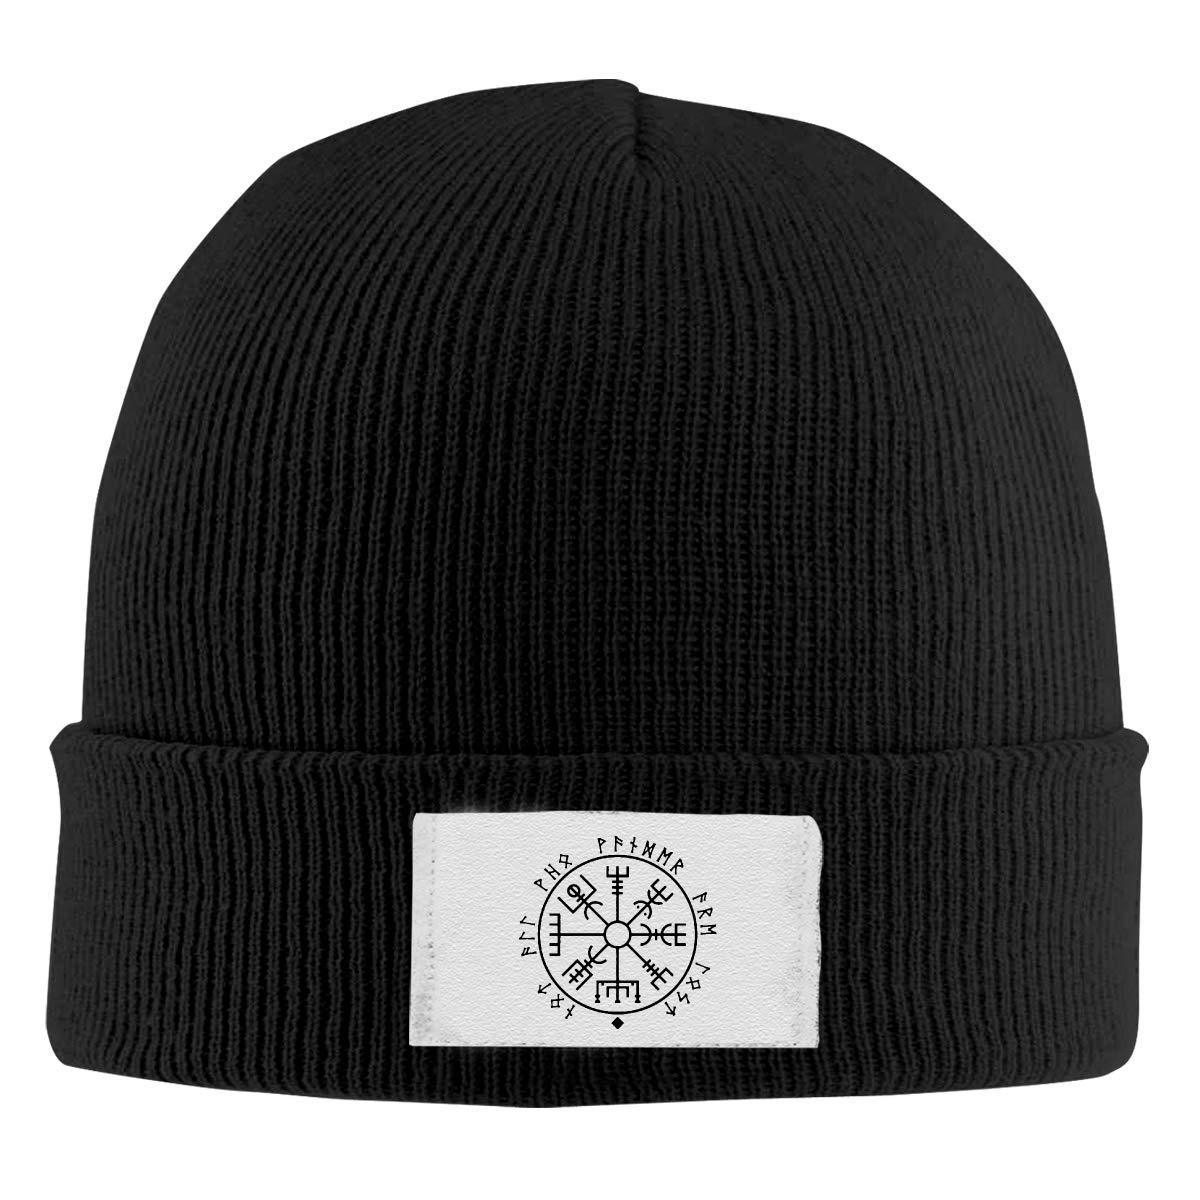 Unisex Stylish Slouch Beanie Hats Black Compass Top Level Beanie Men Women